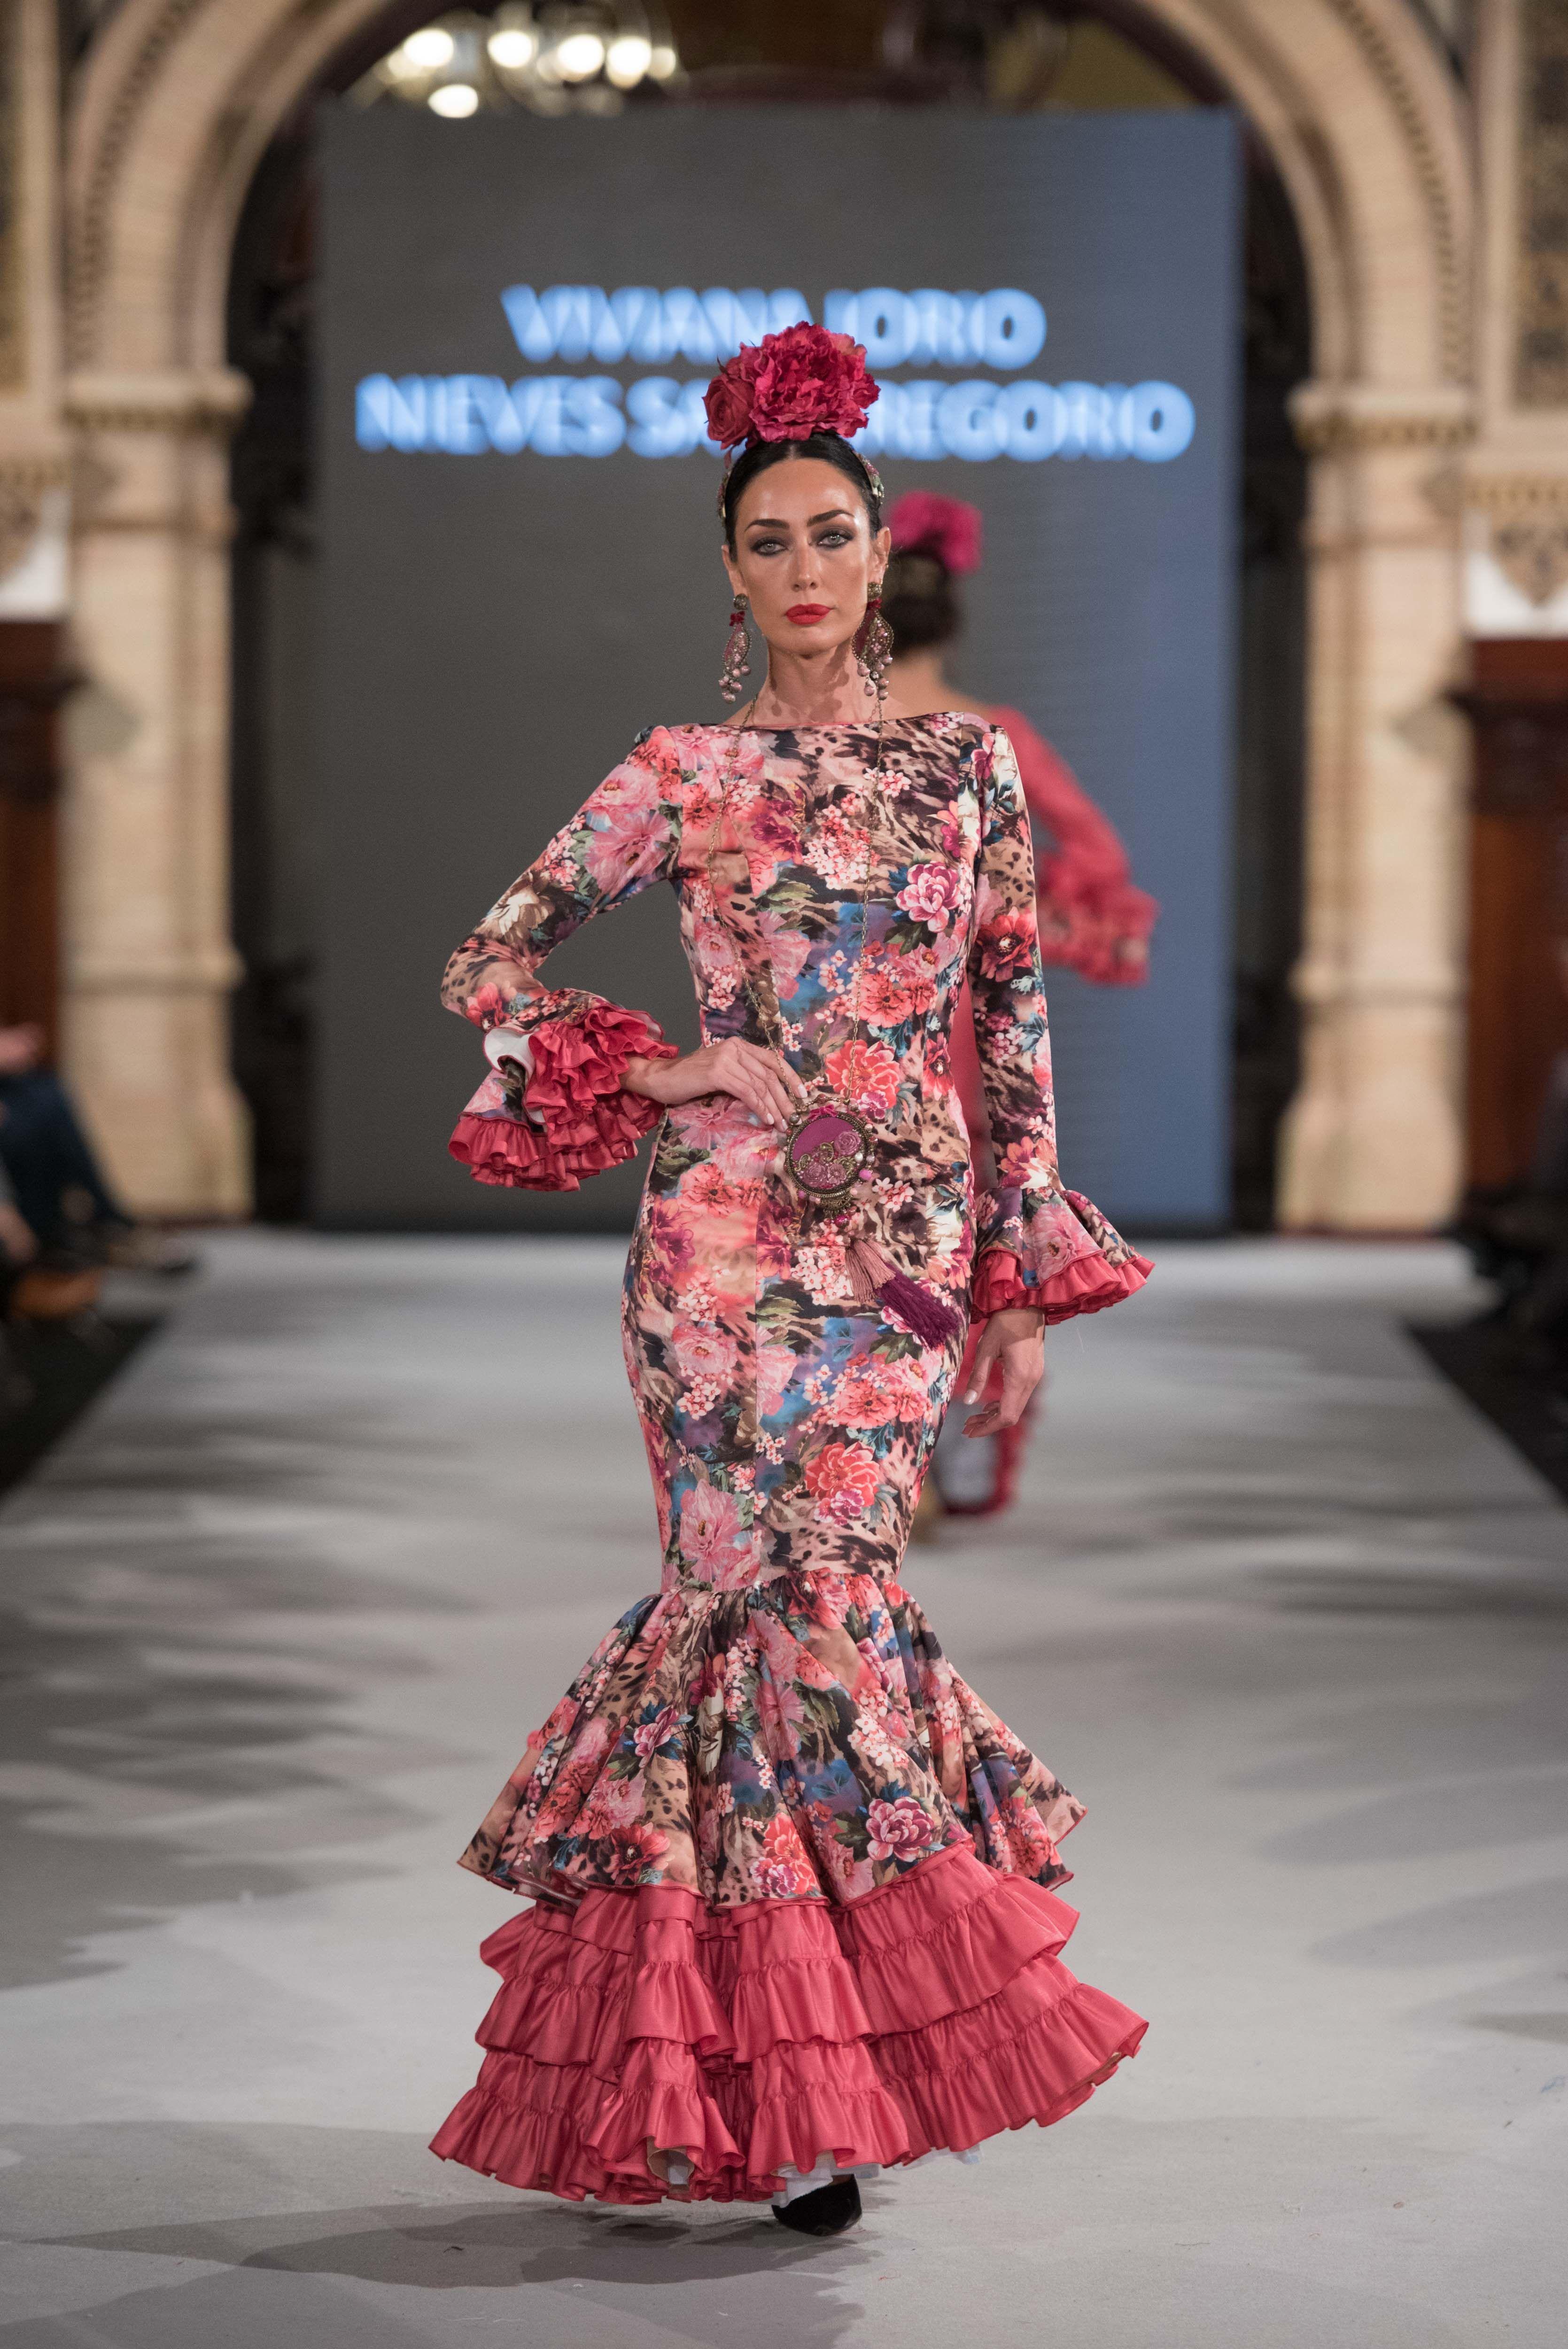 3b672717b Viviana Iorio - We Love Flamenco 2018 - Sevilla | Flamenca ...